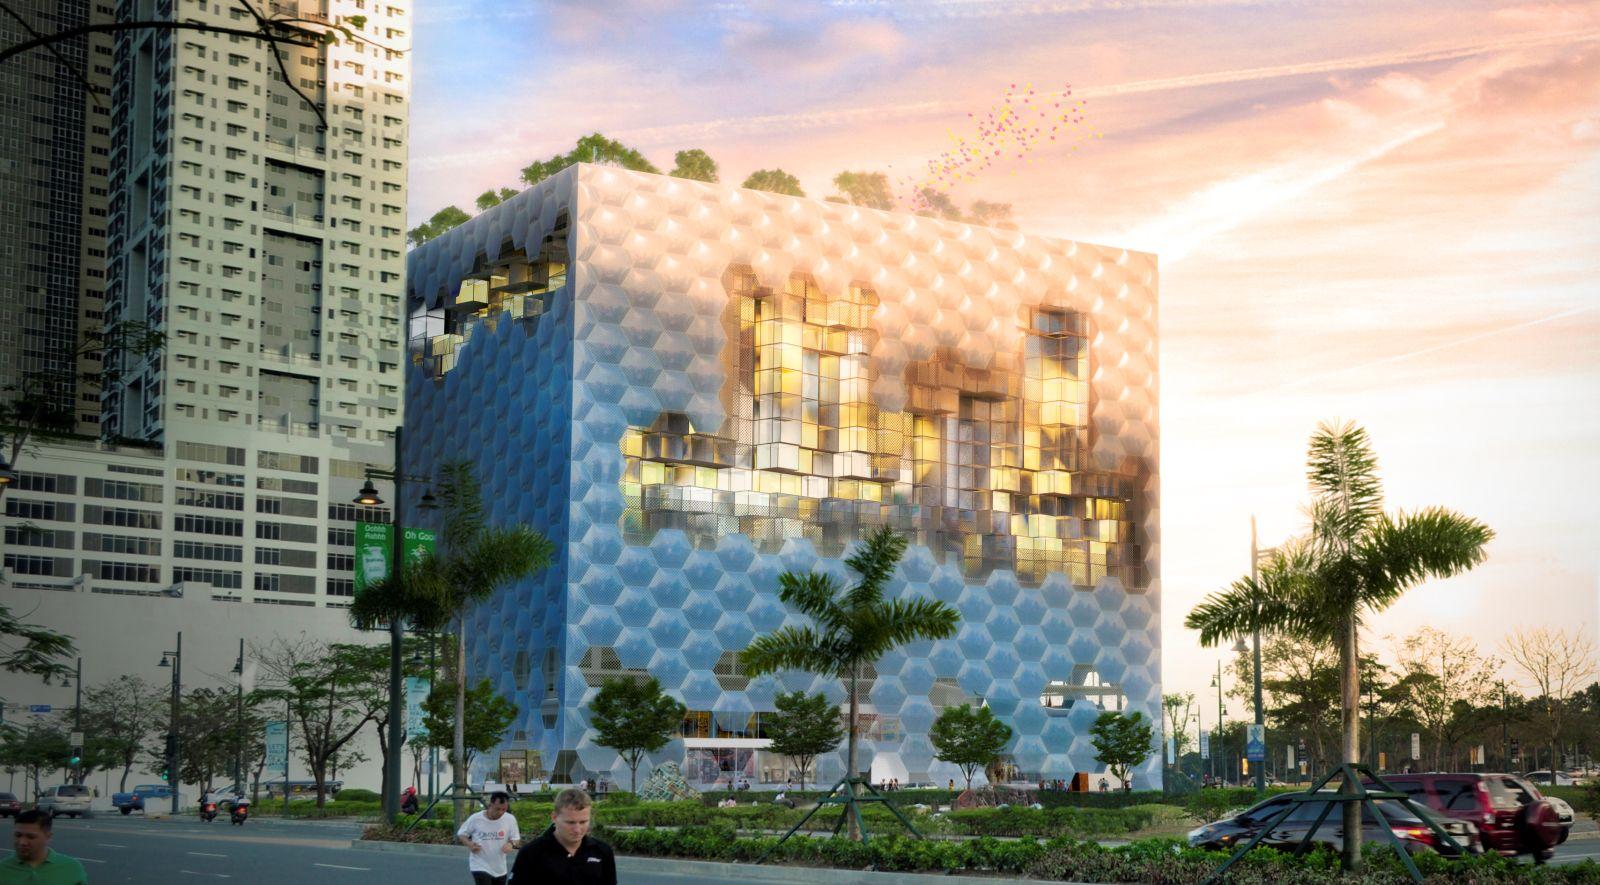 Project Urban Block